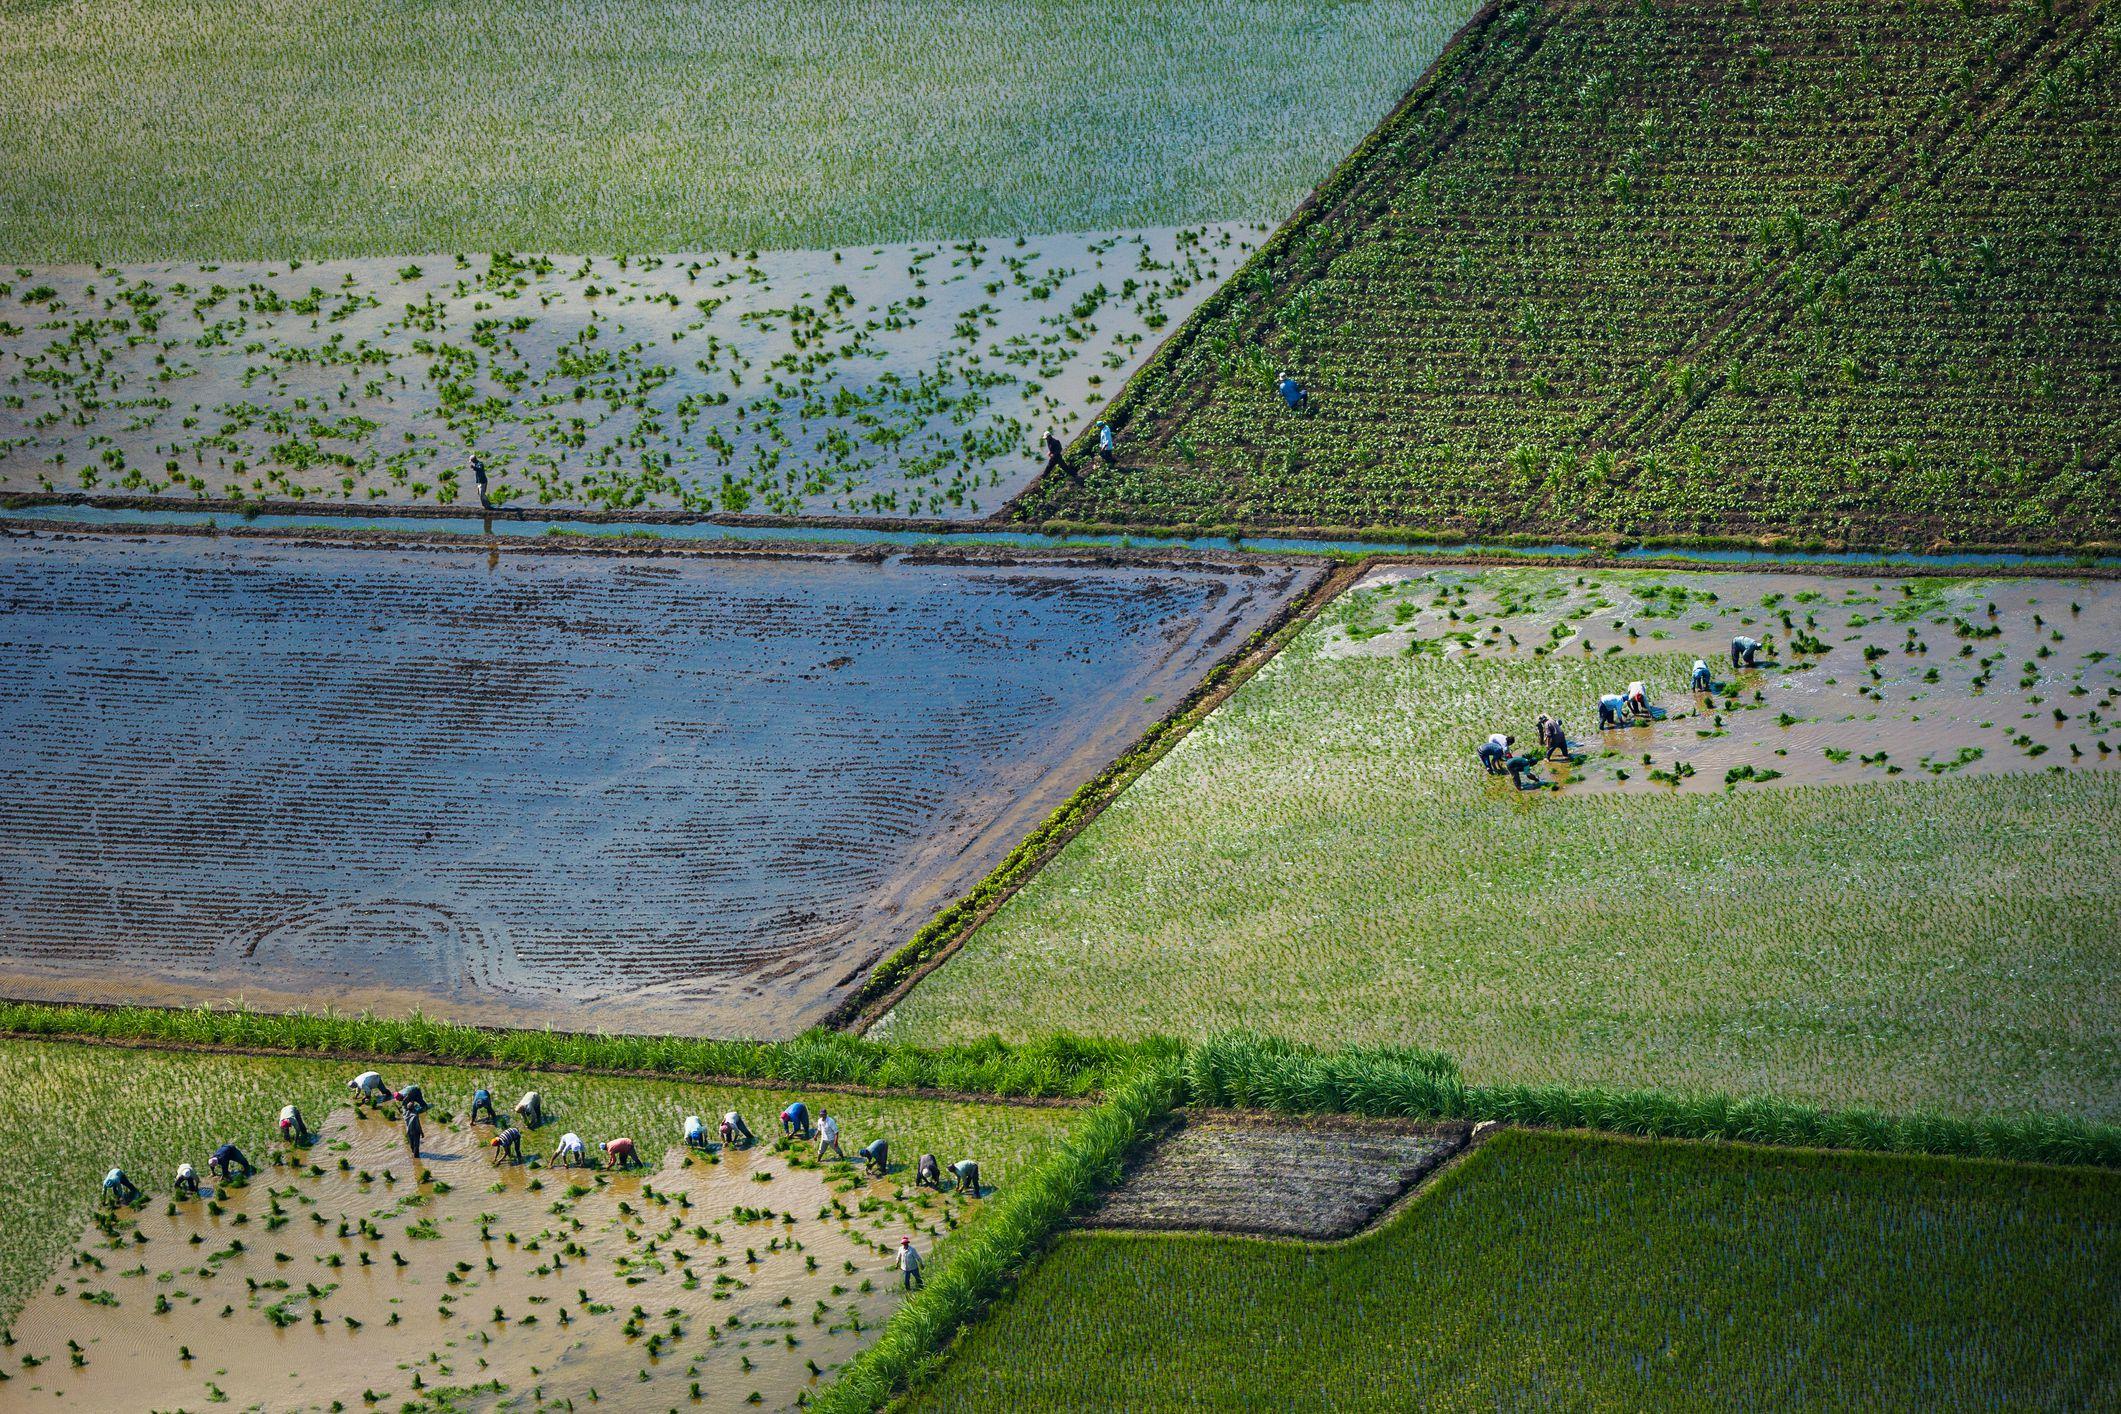 Rice farmers in the Nile Delta, Egypt